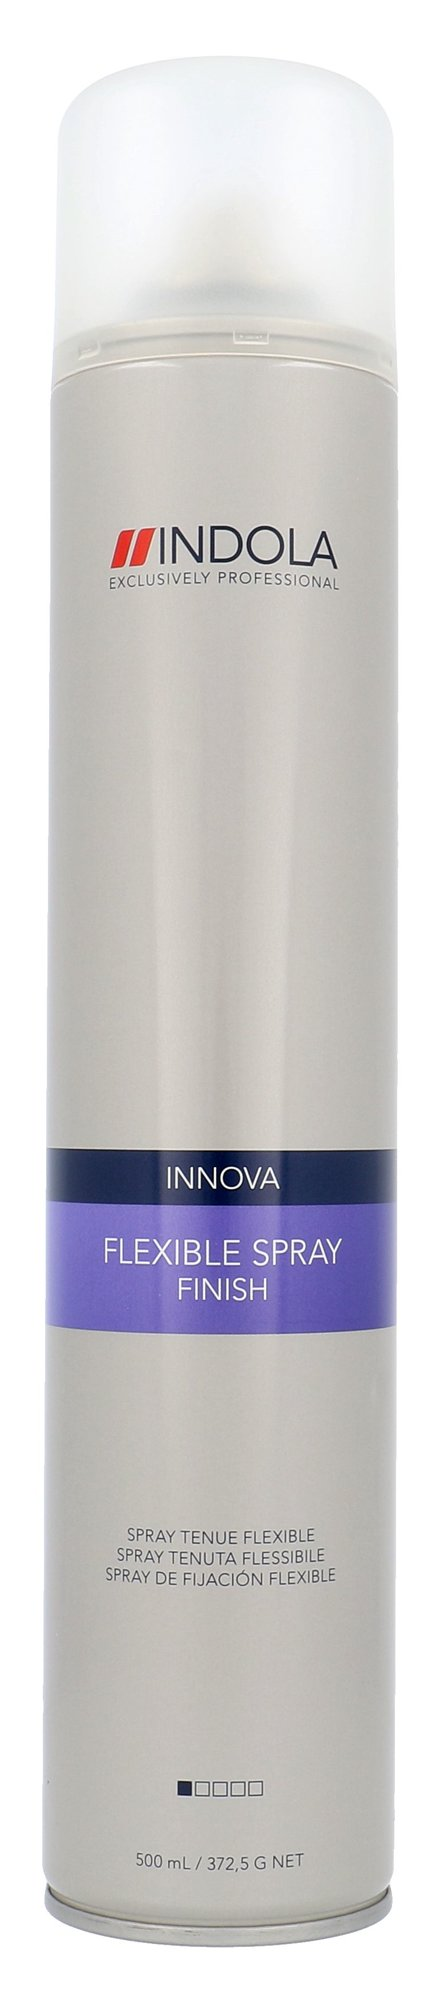 Indola Innova Finish Cosmetic 500ml  Flexible Spray